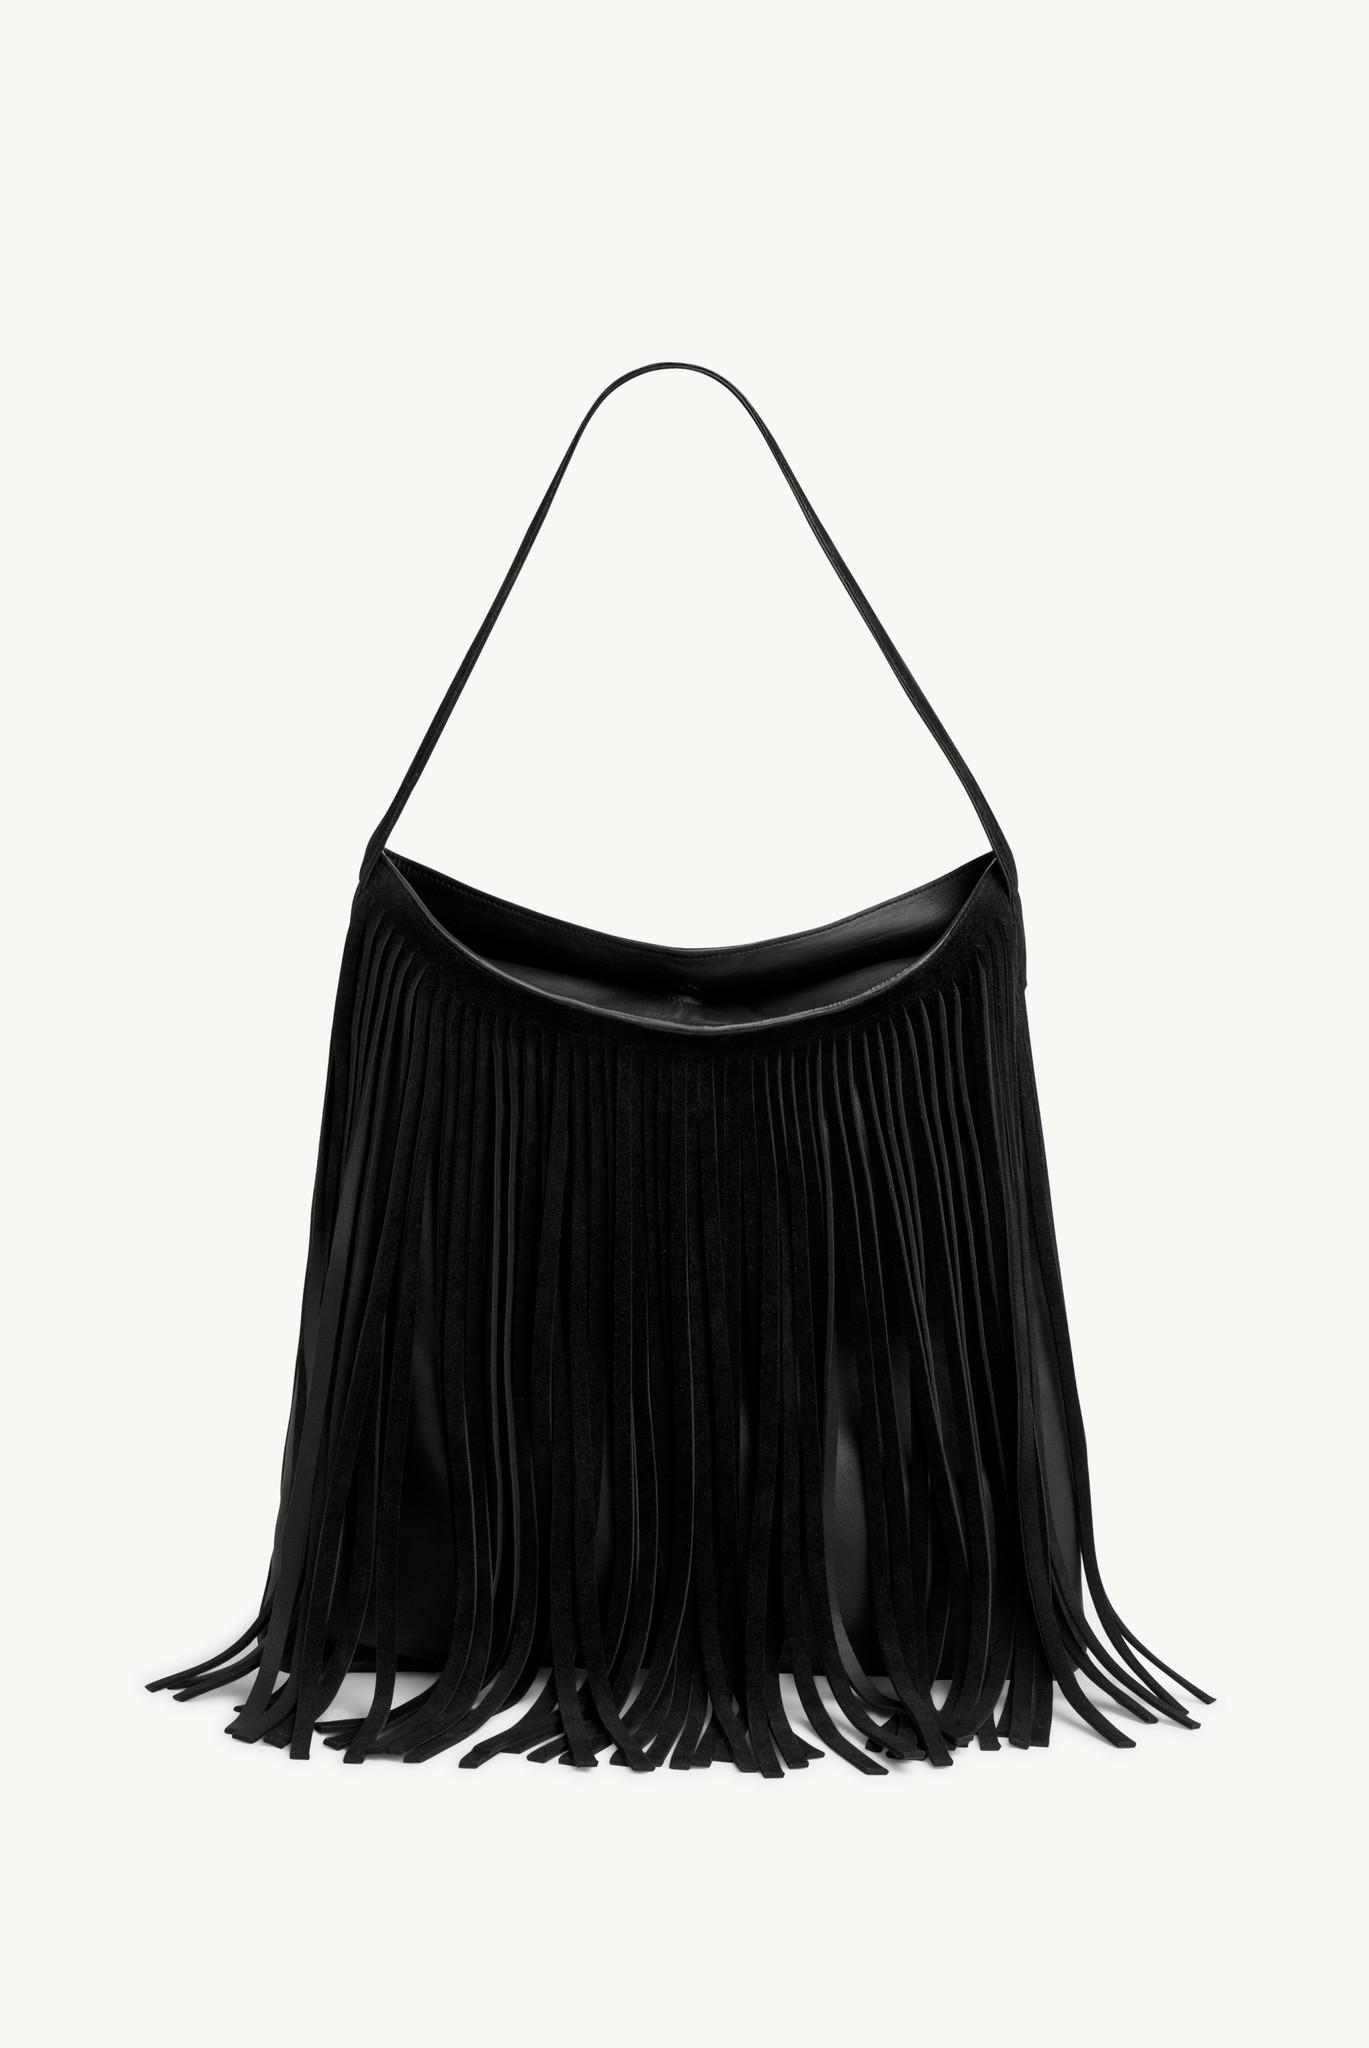 LADY HAIR - Сумка-шоппер с бахромой